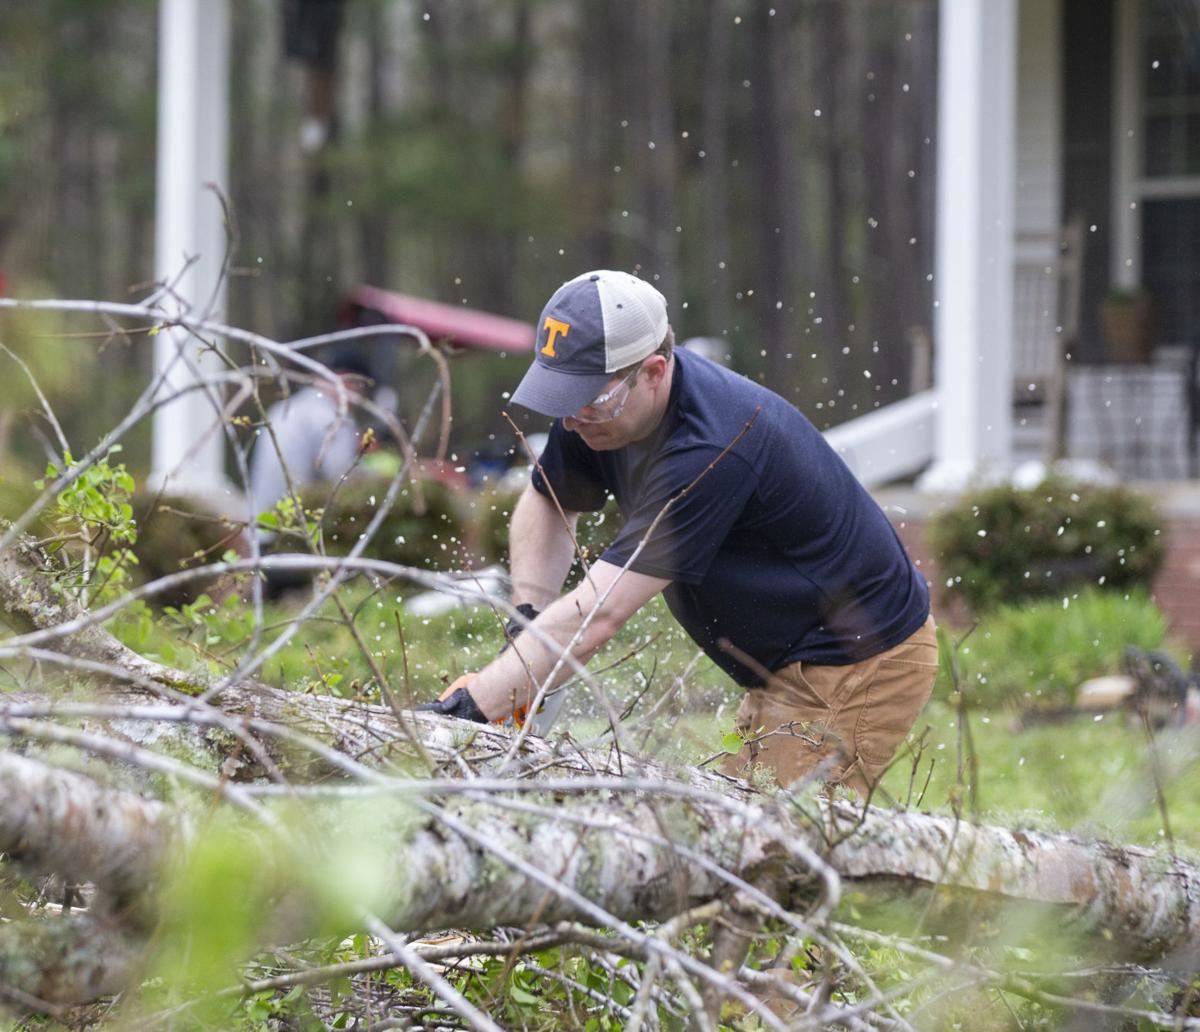 200325 Colbert County tornado damage 5